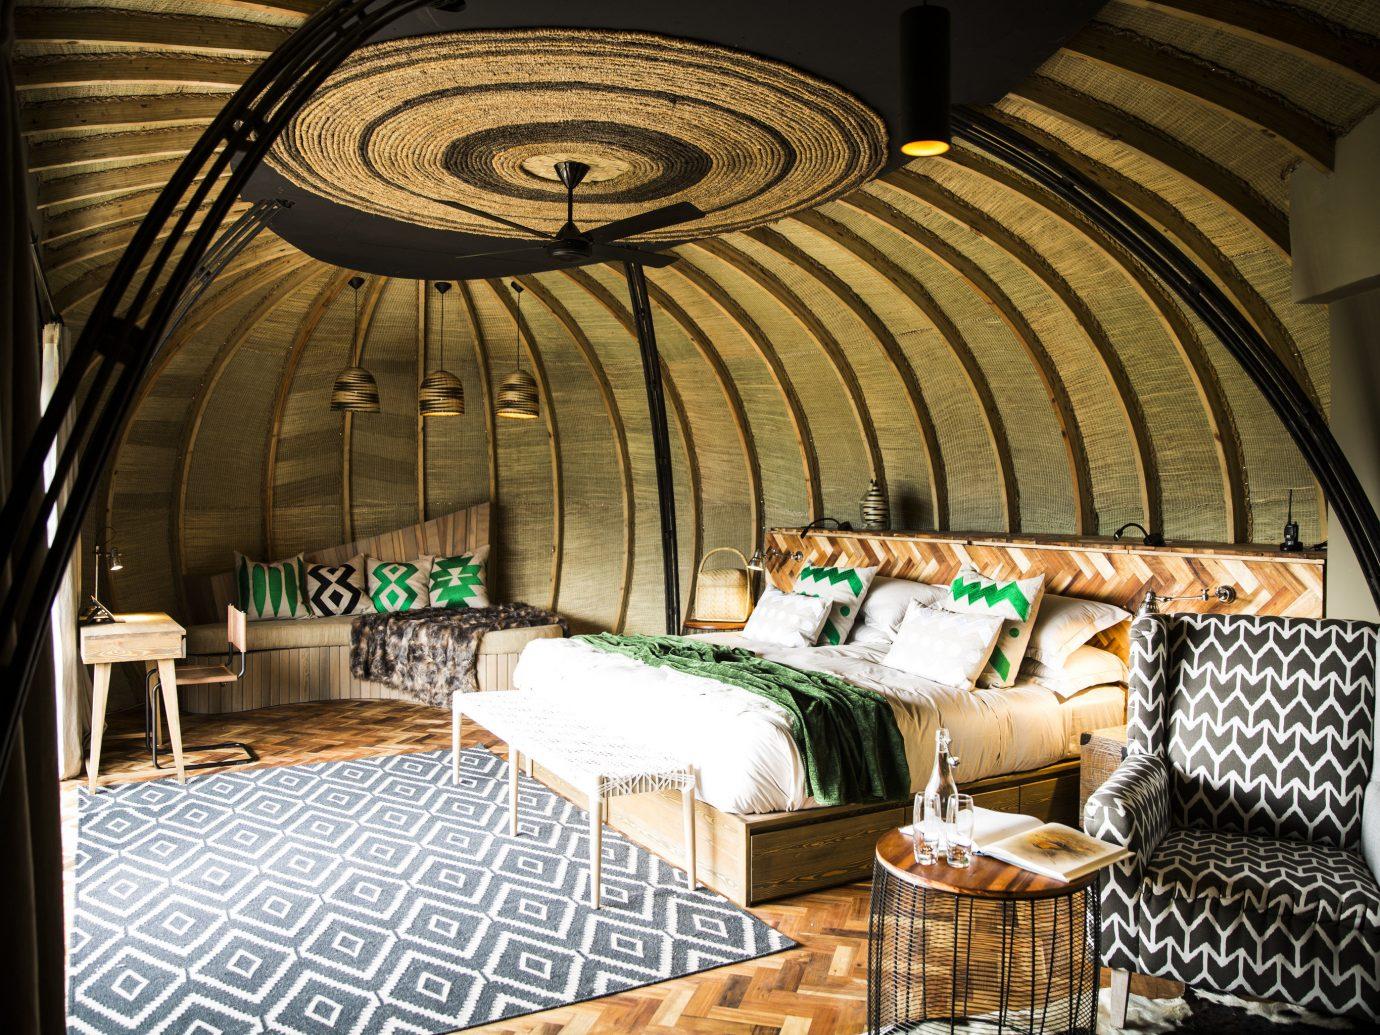 Honeymoon Hotels Luxury Travel Romance indoor chair room Living interior design ceiling home estate furniture